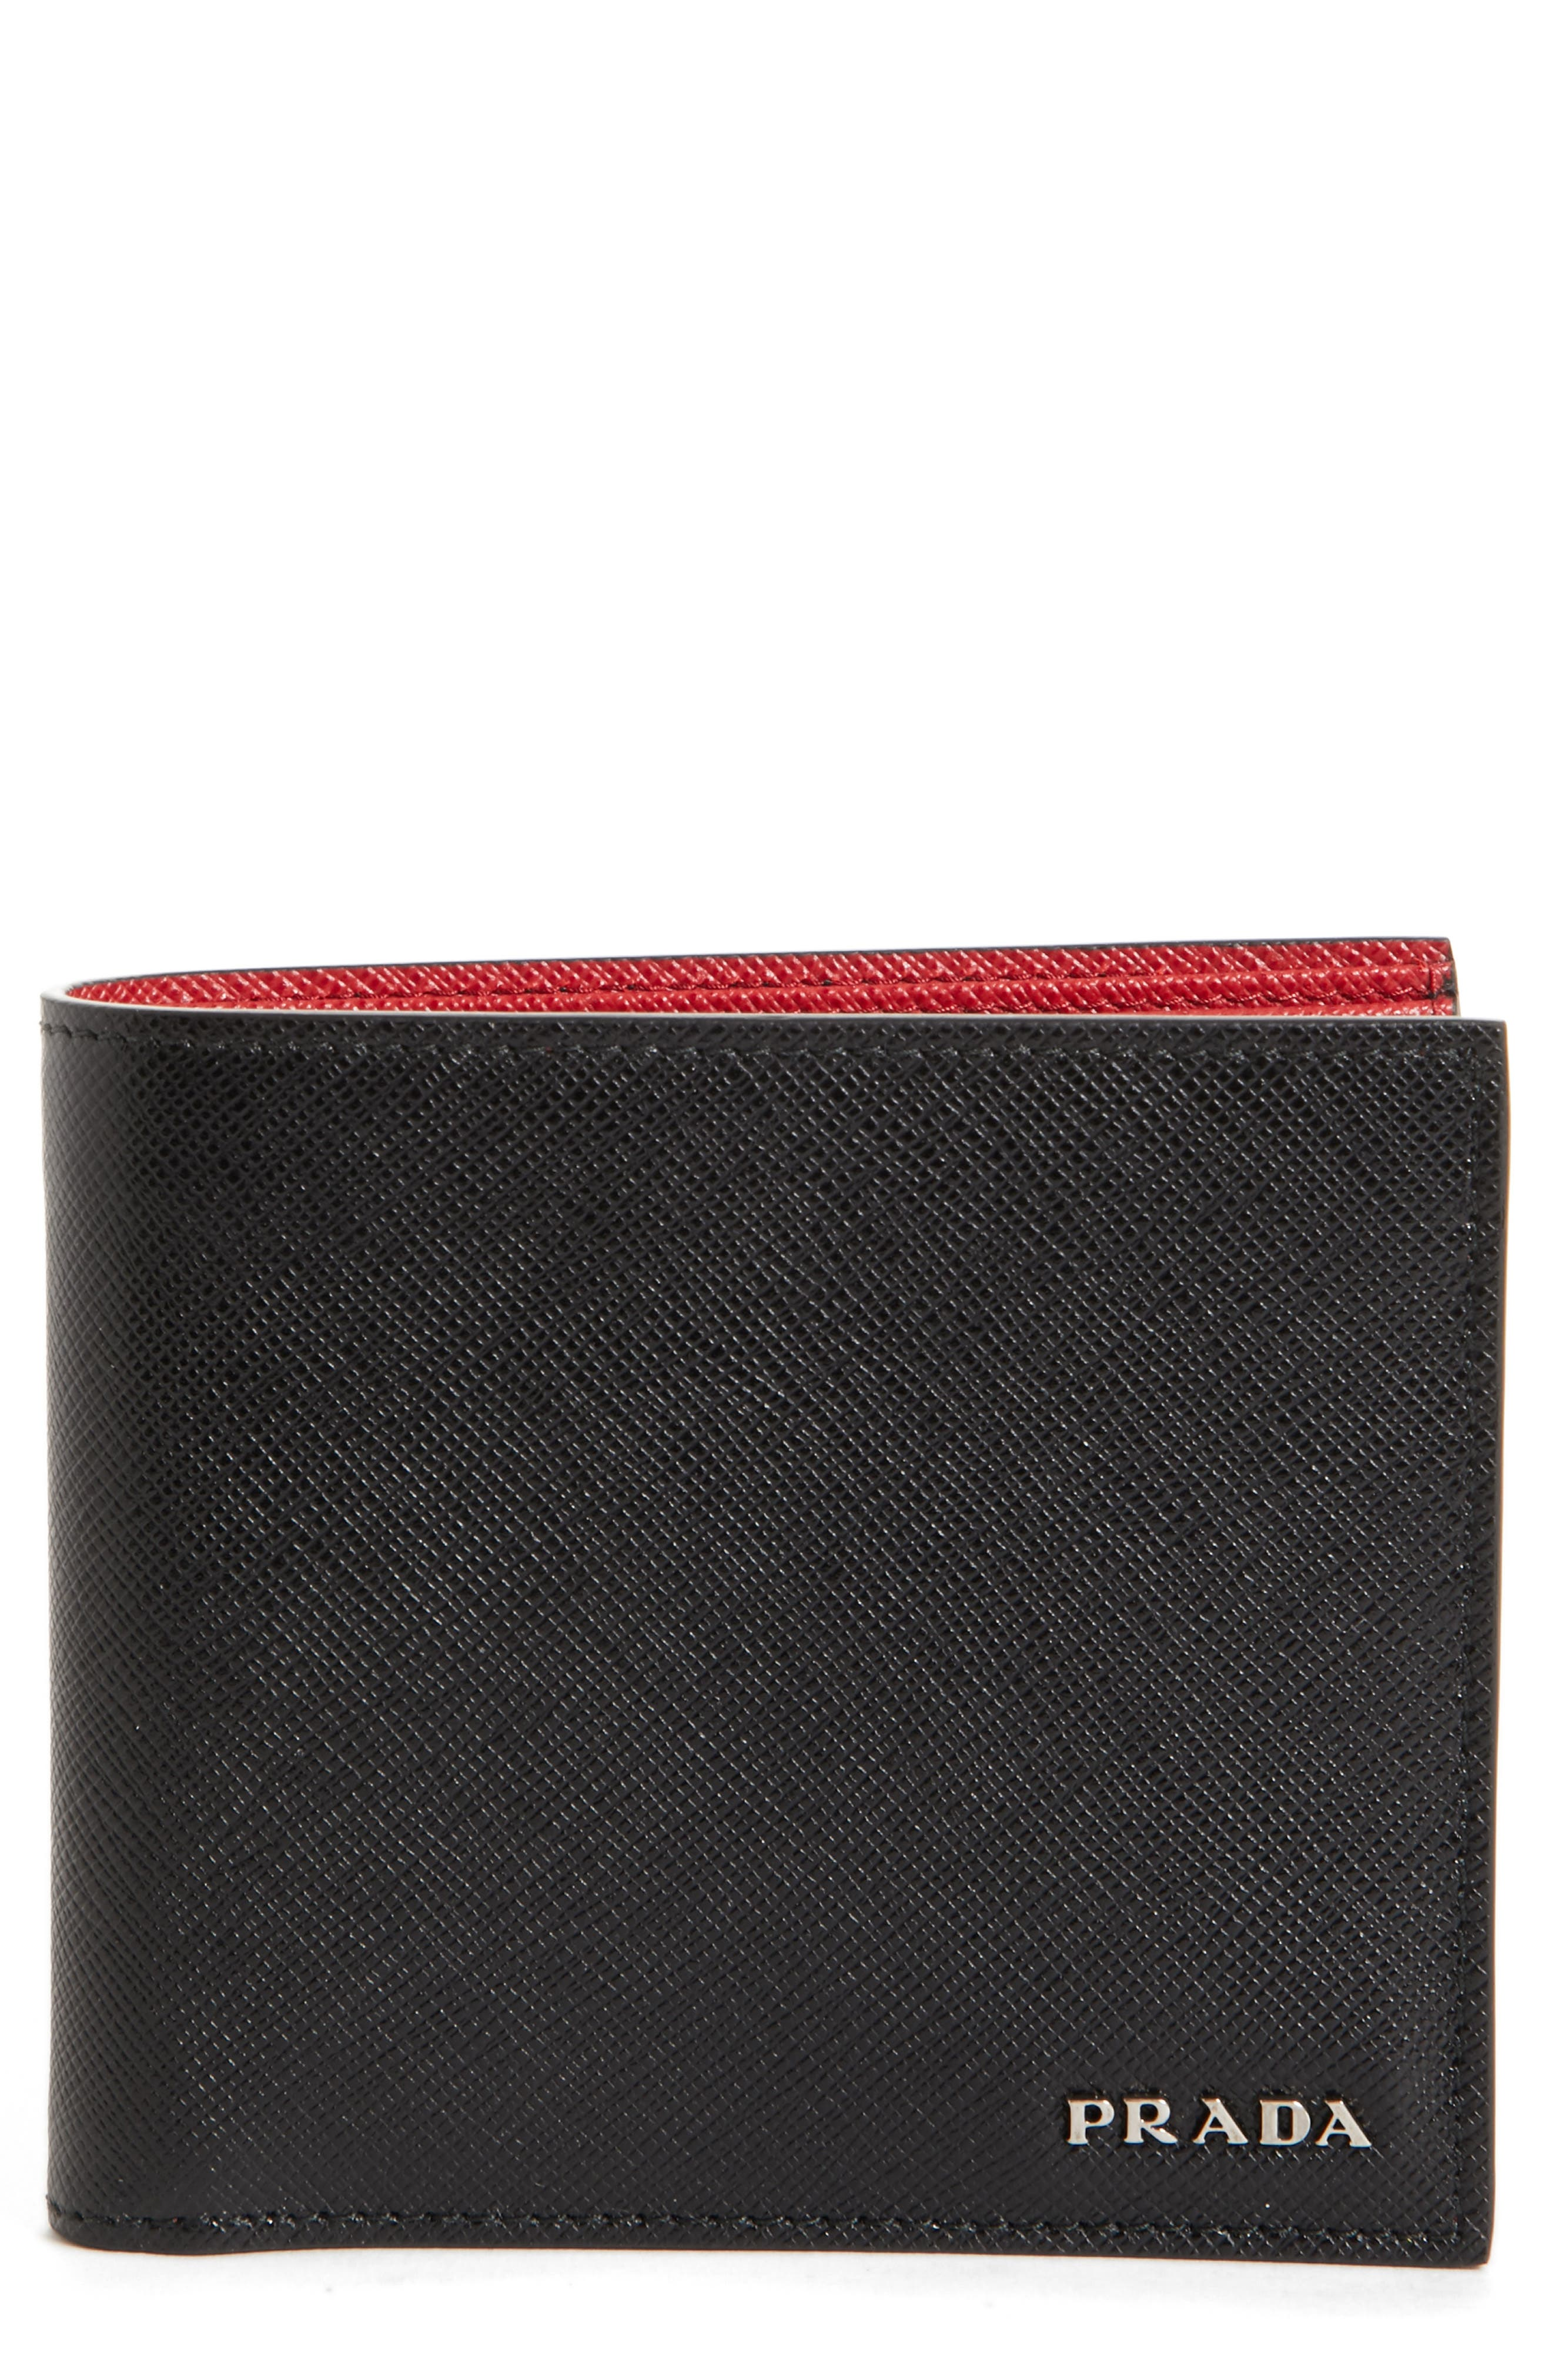 Bicolor Leather Wallet,                             Main thumbnail 1, color,                             001